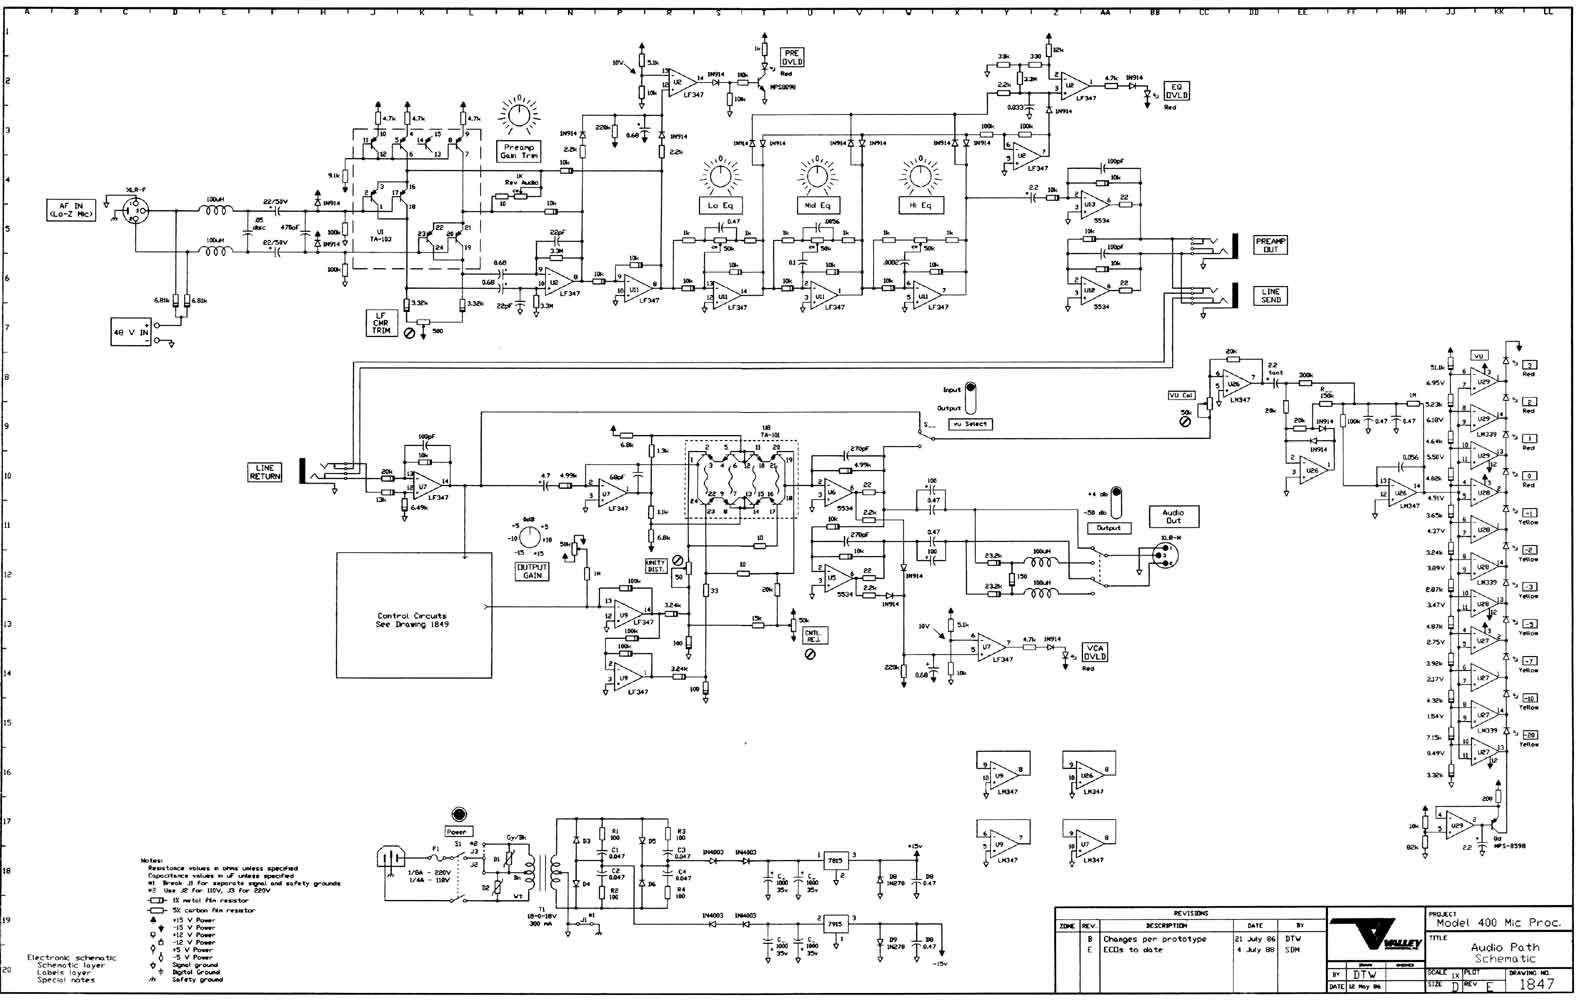 valley 400 mic processor schematic Cryogenic Processor Schematics Processor Schematic #10